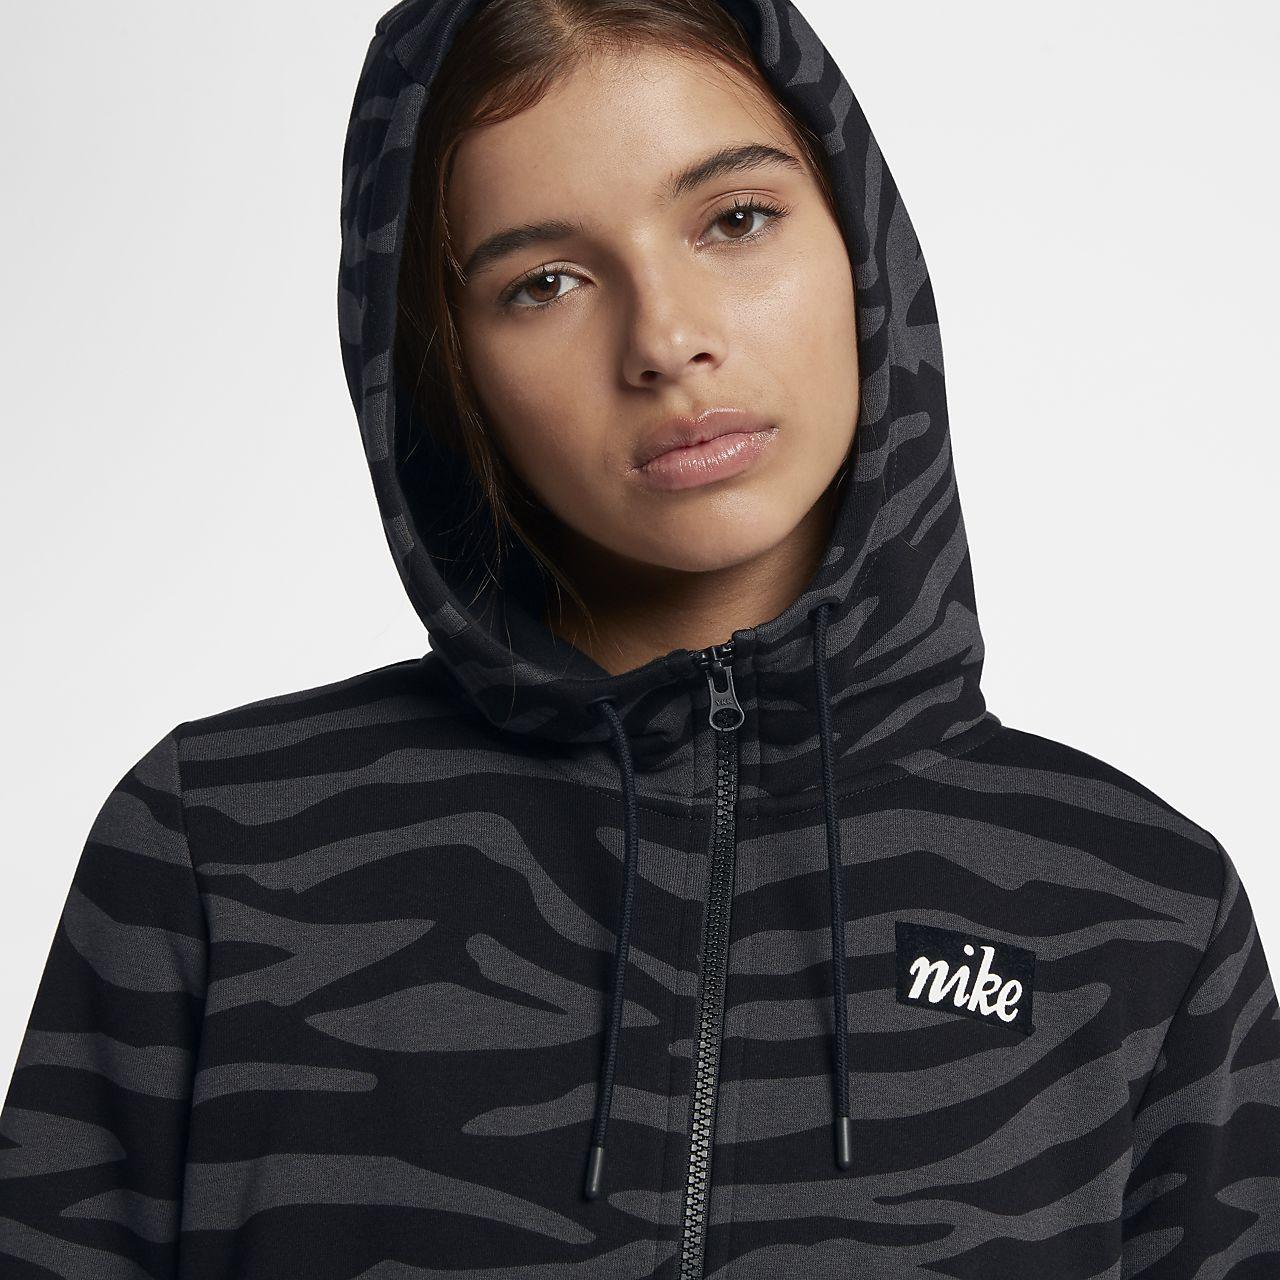 a12b9d7b715c Nike Sportswear Women s Full-Zip Animal Hoodie. Nike.com ZA